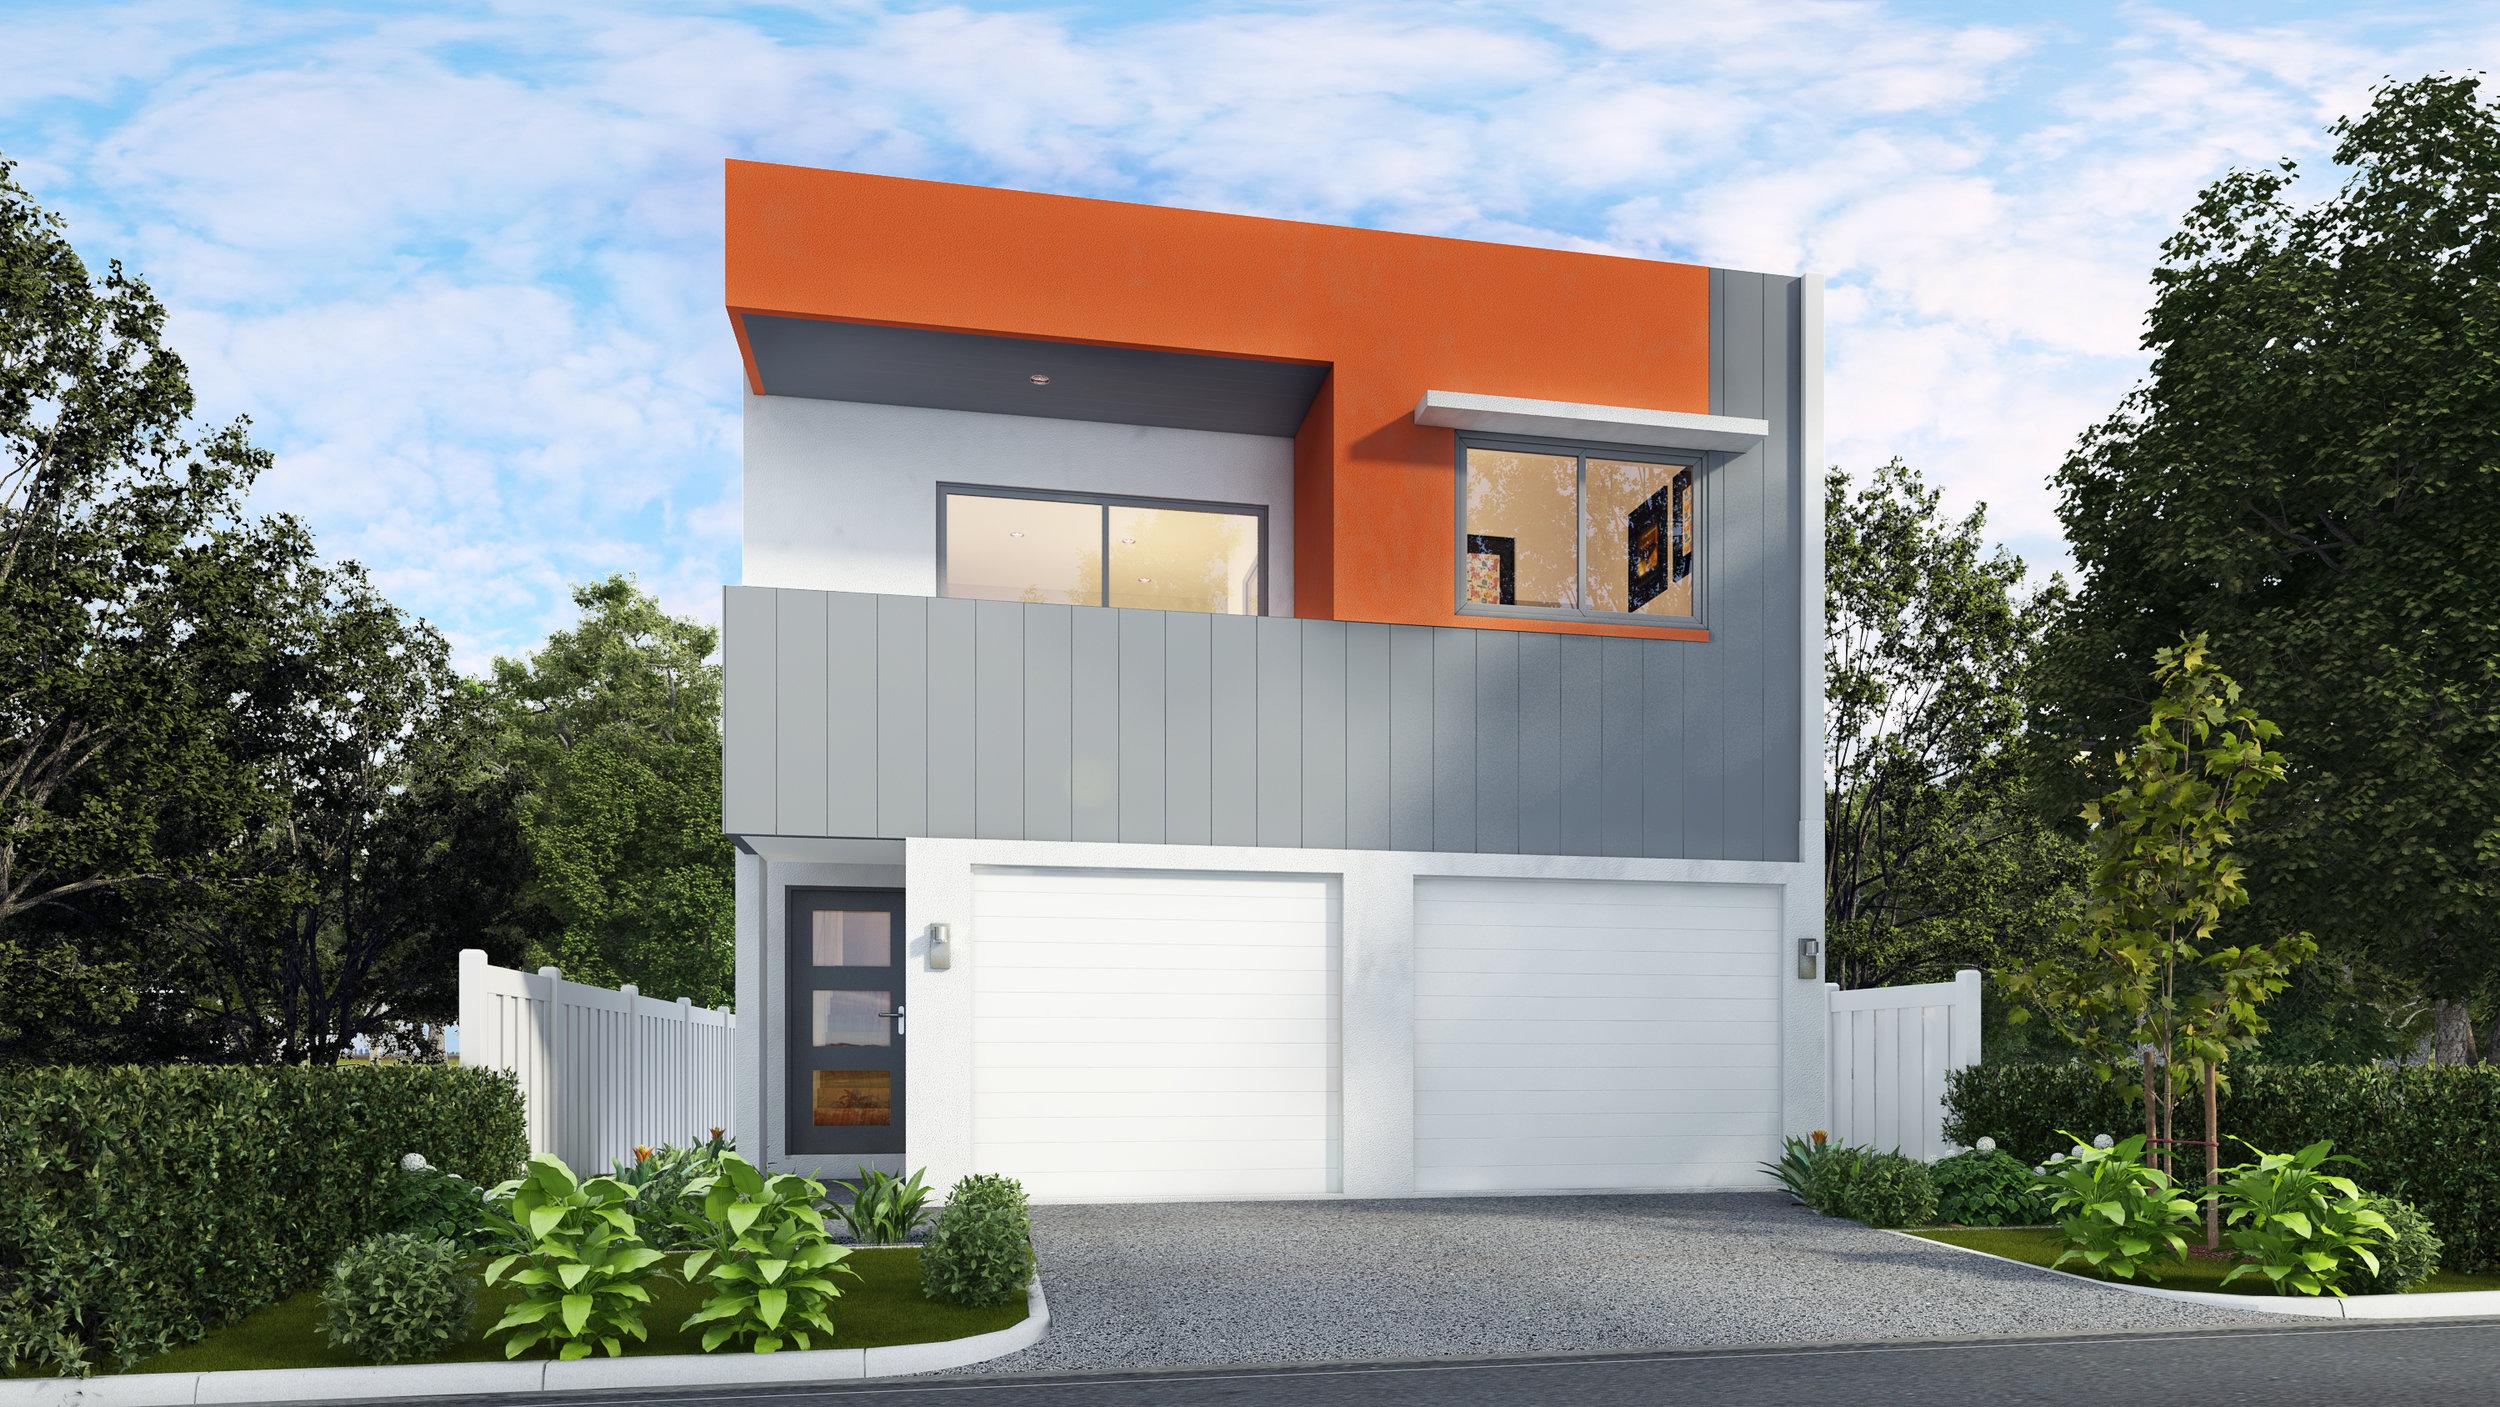 The Parkview 1 - 1 Bed | 1 Bath | 1 Car Garage7.5m Dual Occupancy Laneway Lots